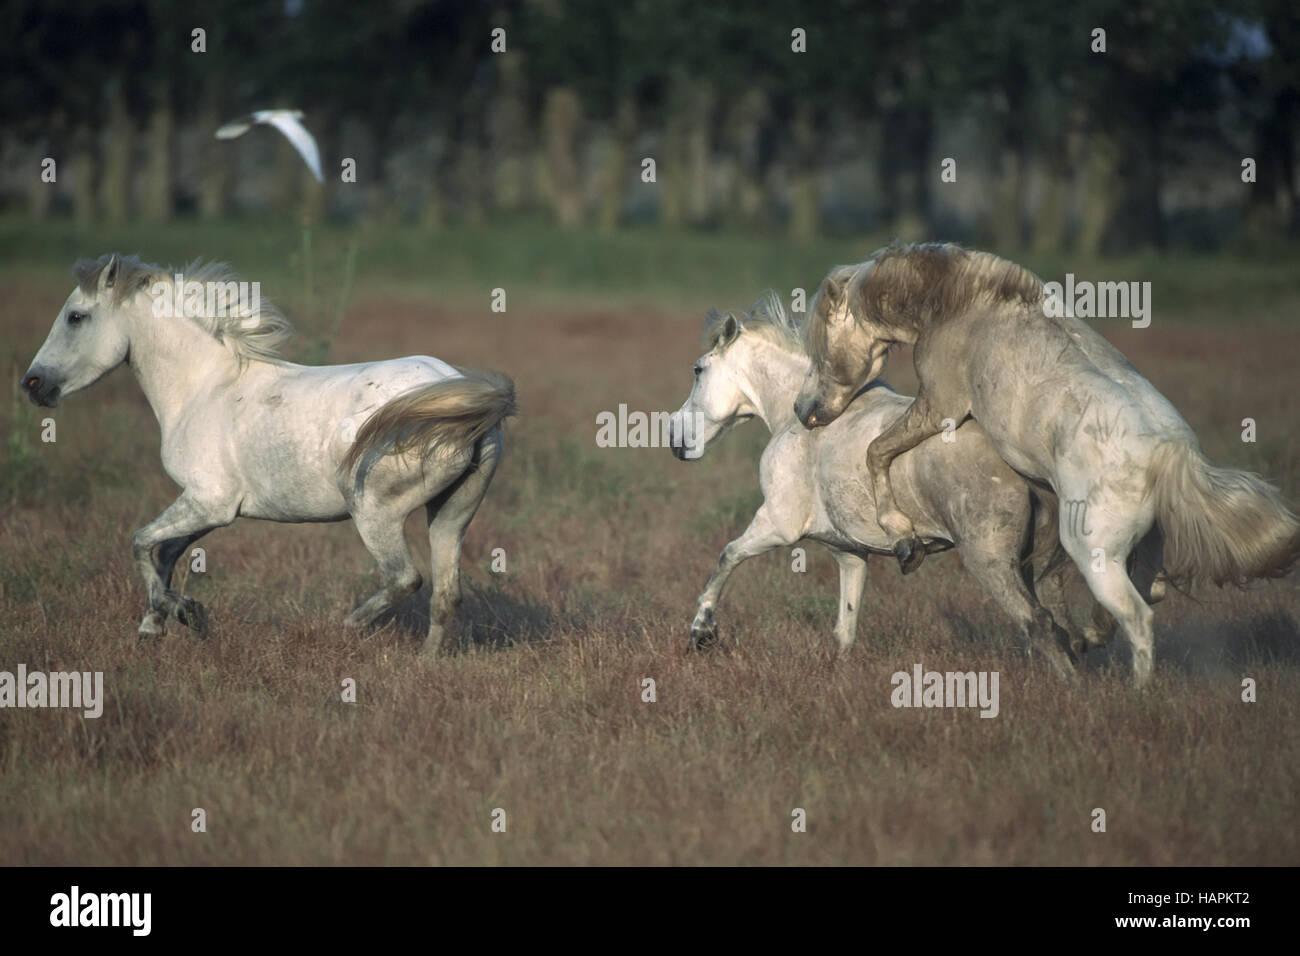 Camargue-Pferde Camargue horses - Stock Image